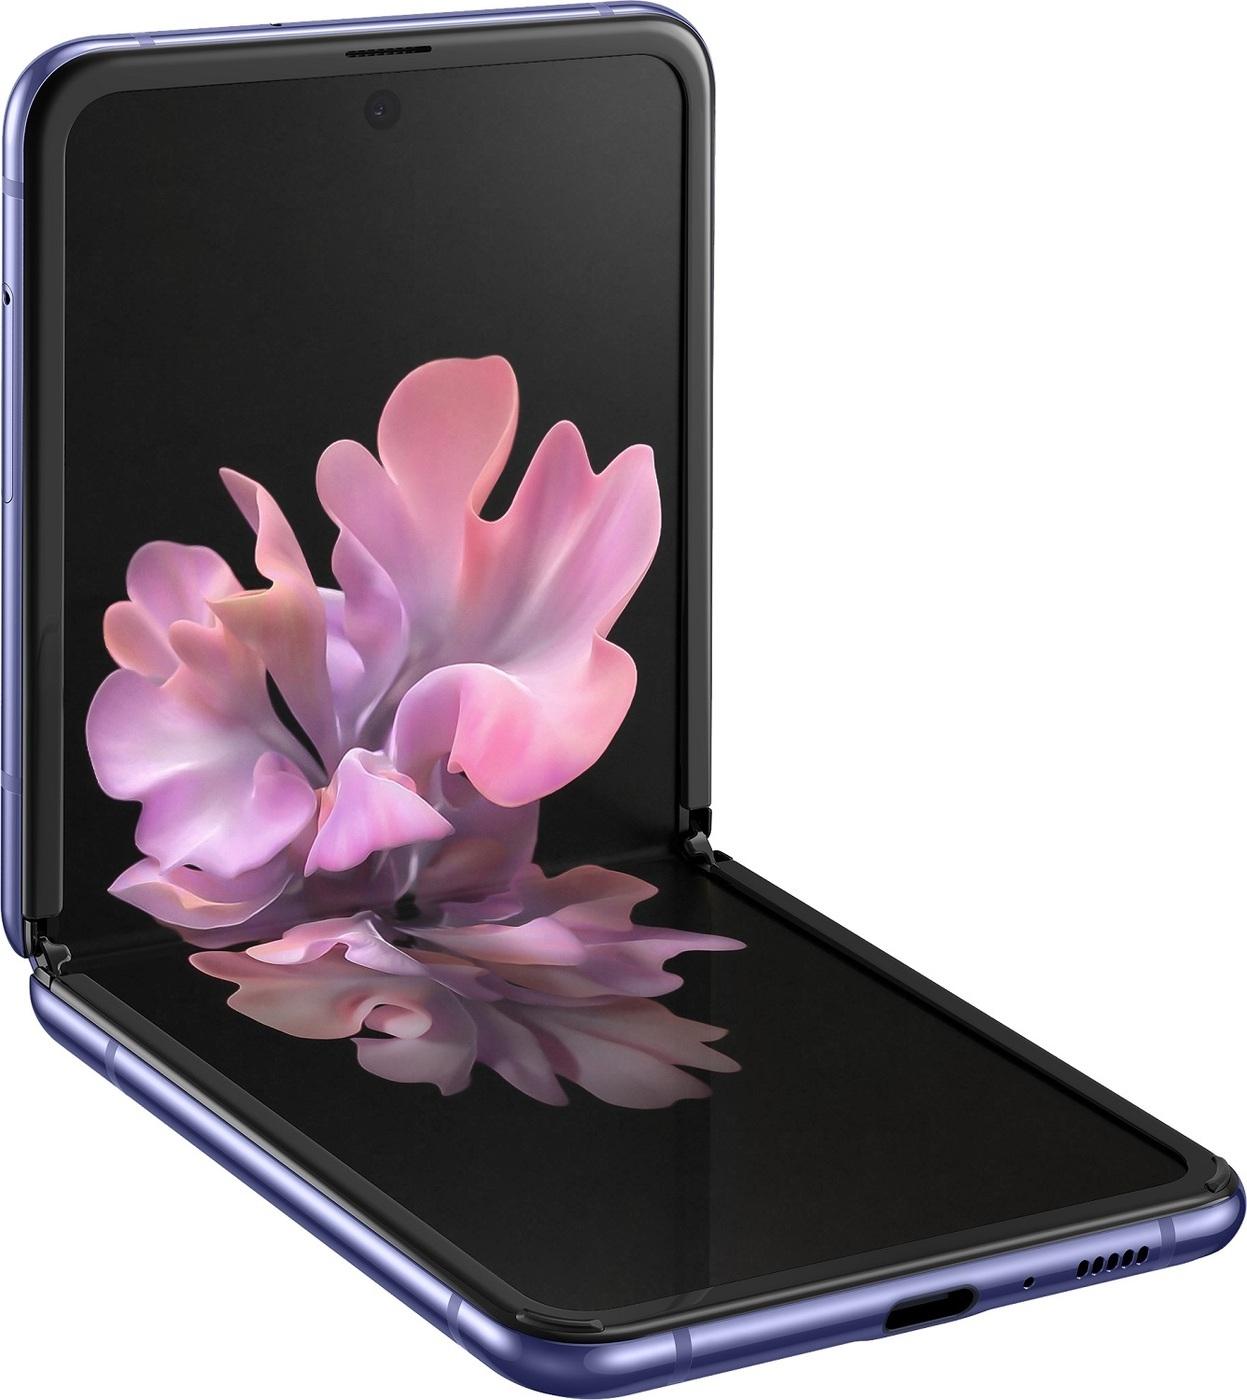 смартфон samsung galaxy z flip  8/256gb, чёрный бриллиант. уцененный товар